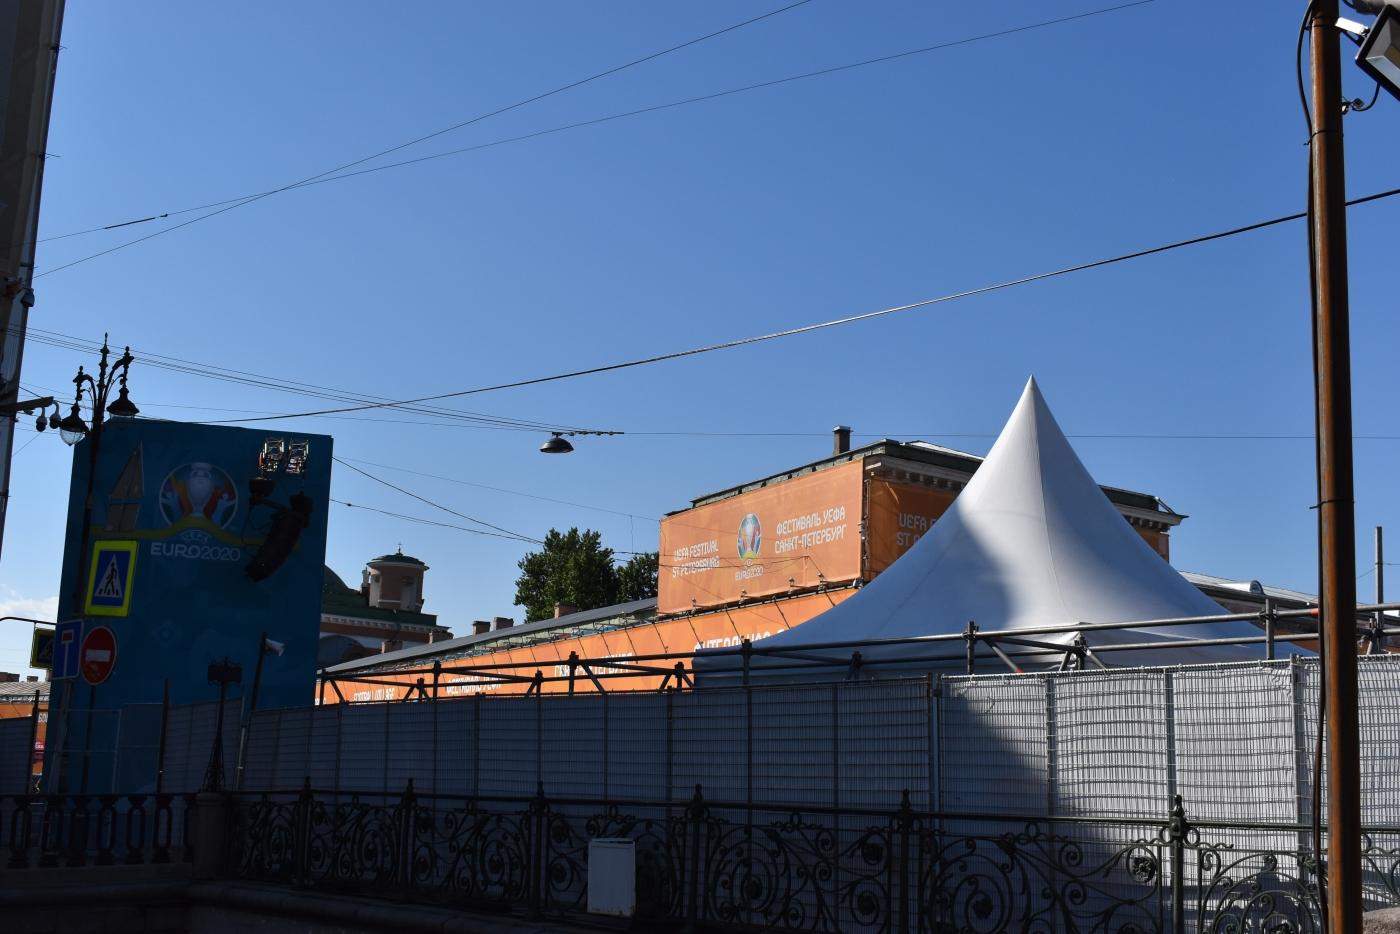 Футбол Санкт-Петербург. Фан-зоны Евро 2020. Новости евро 2020. Новости футбола. Статистика и результаты футбола.